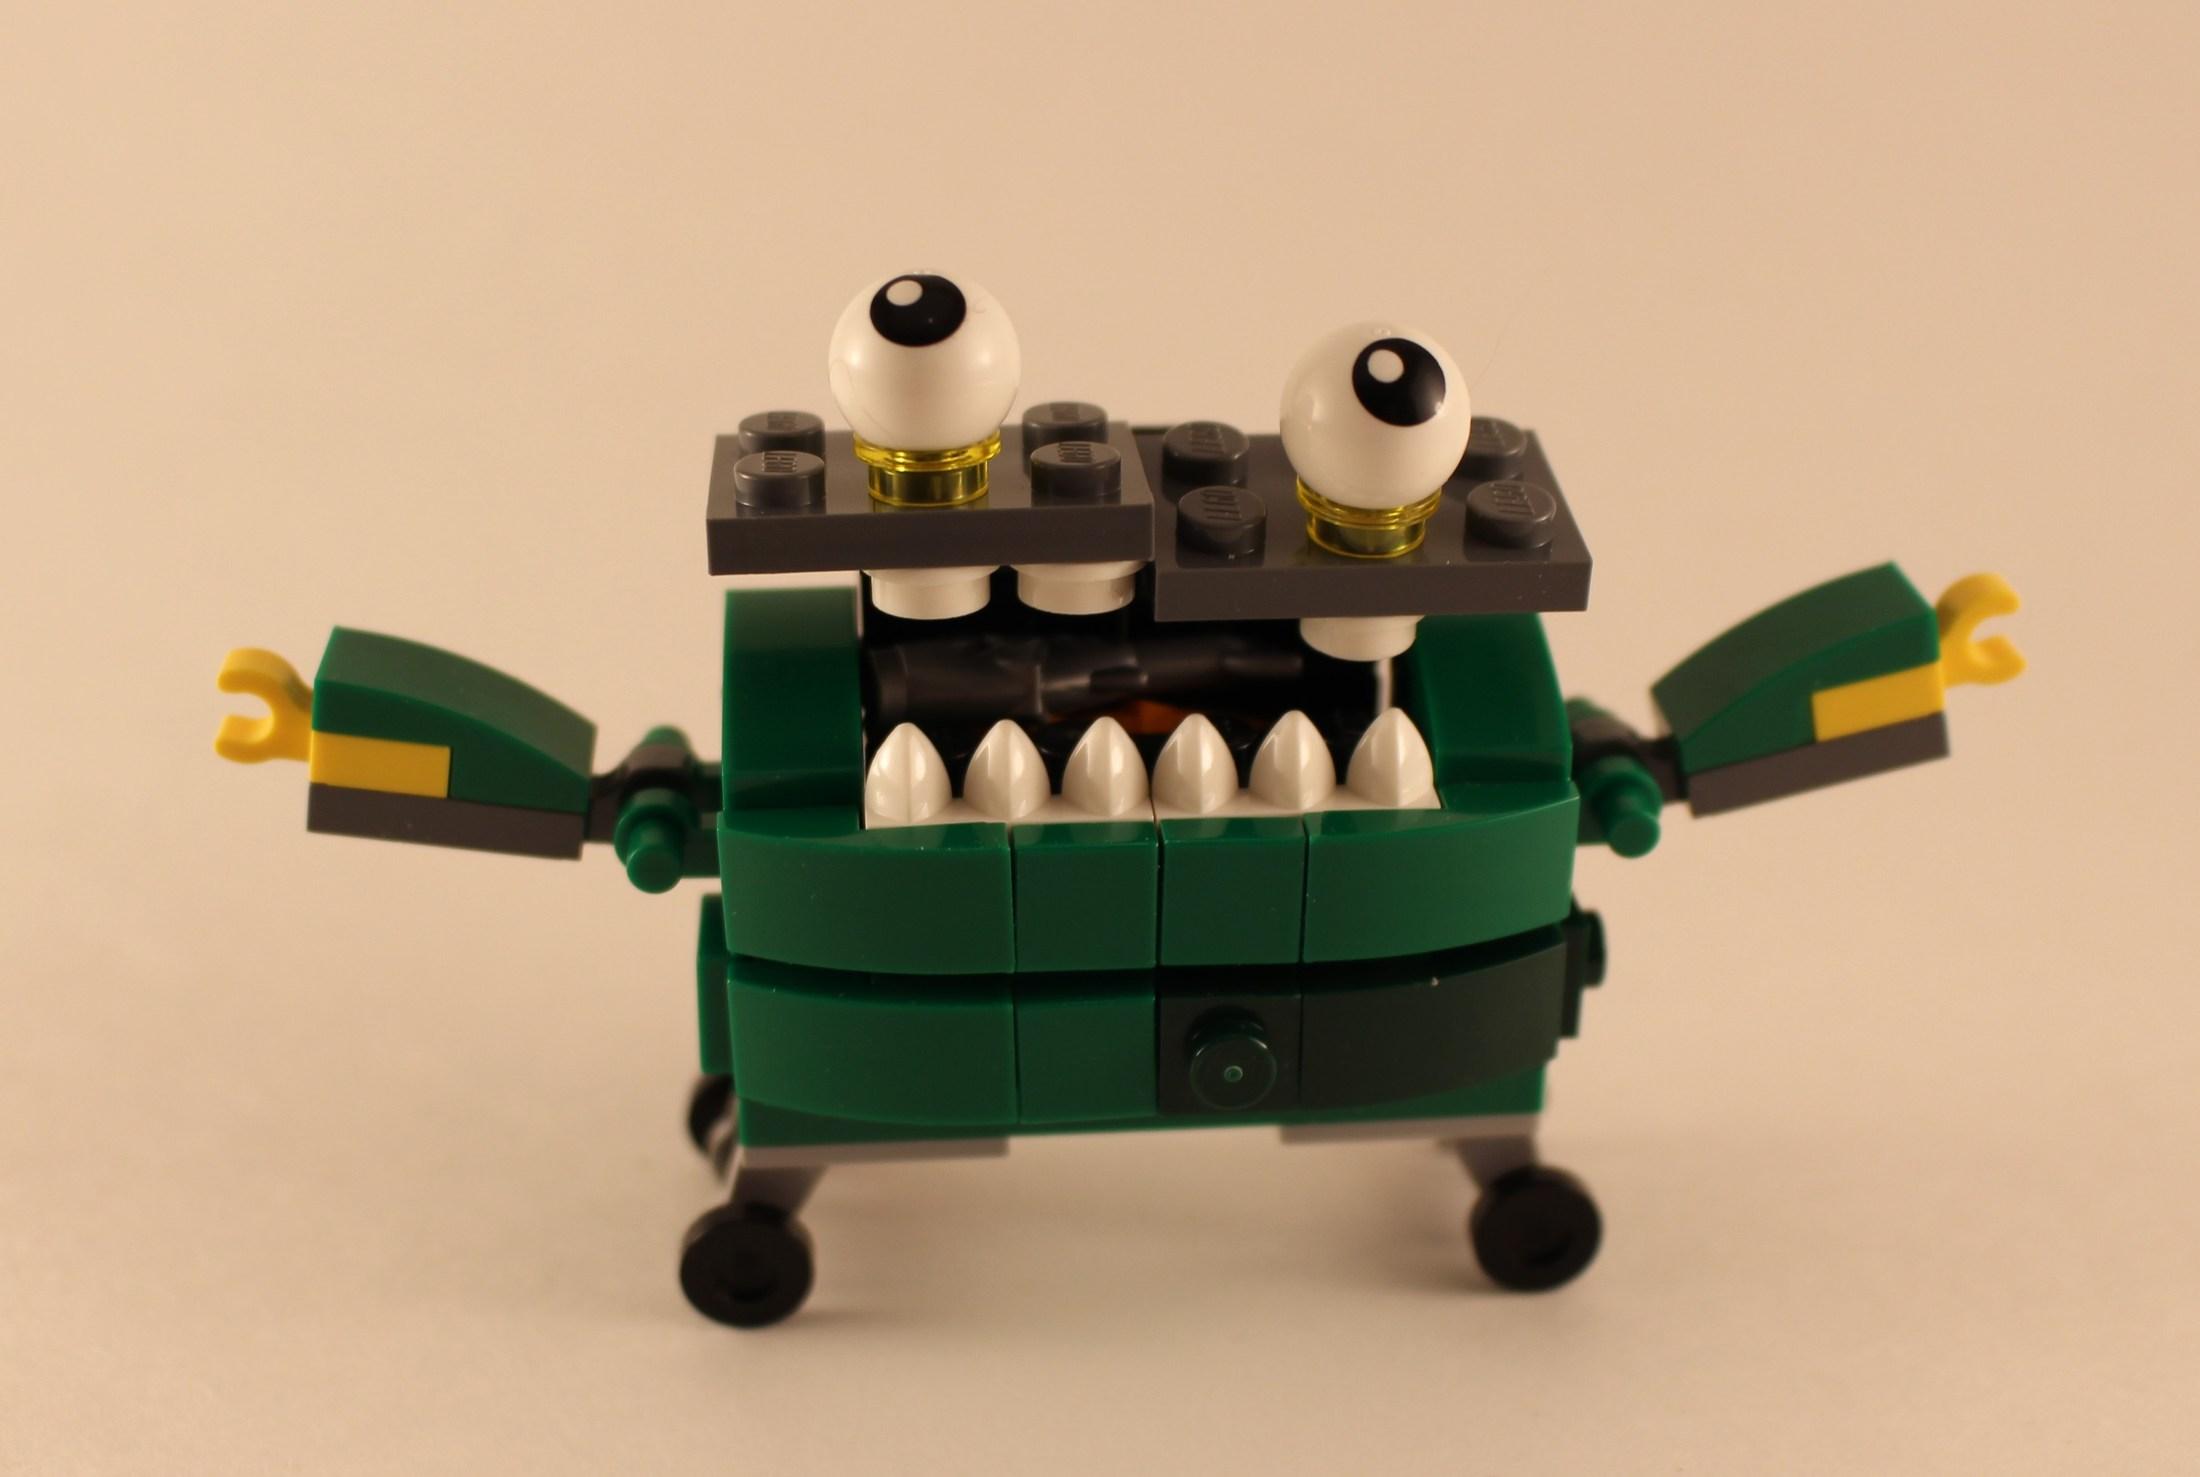 LEGO Trash Can Mixel